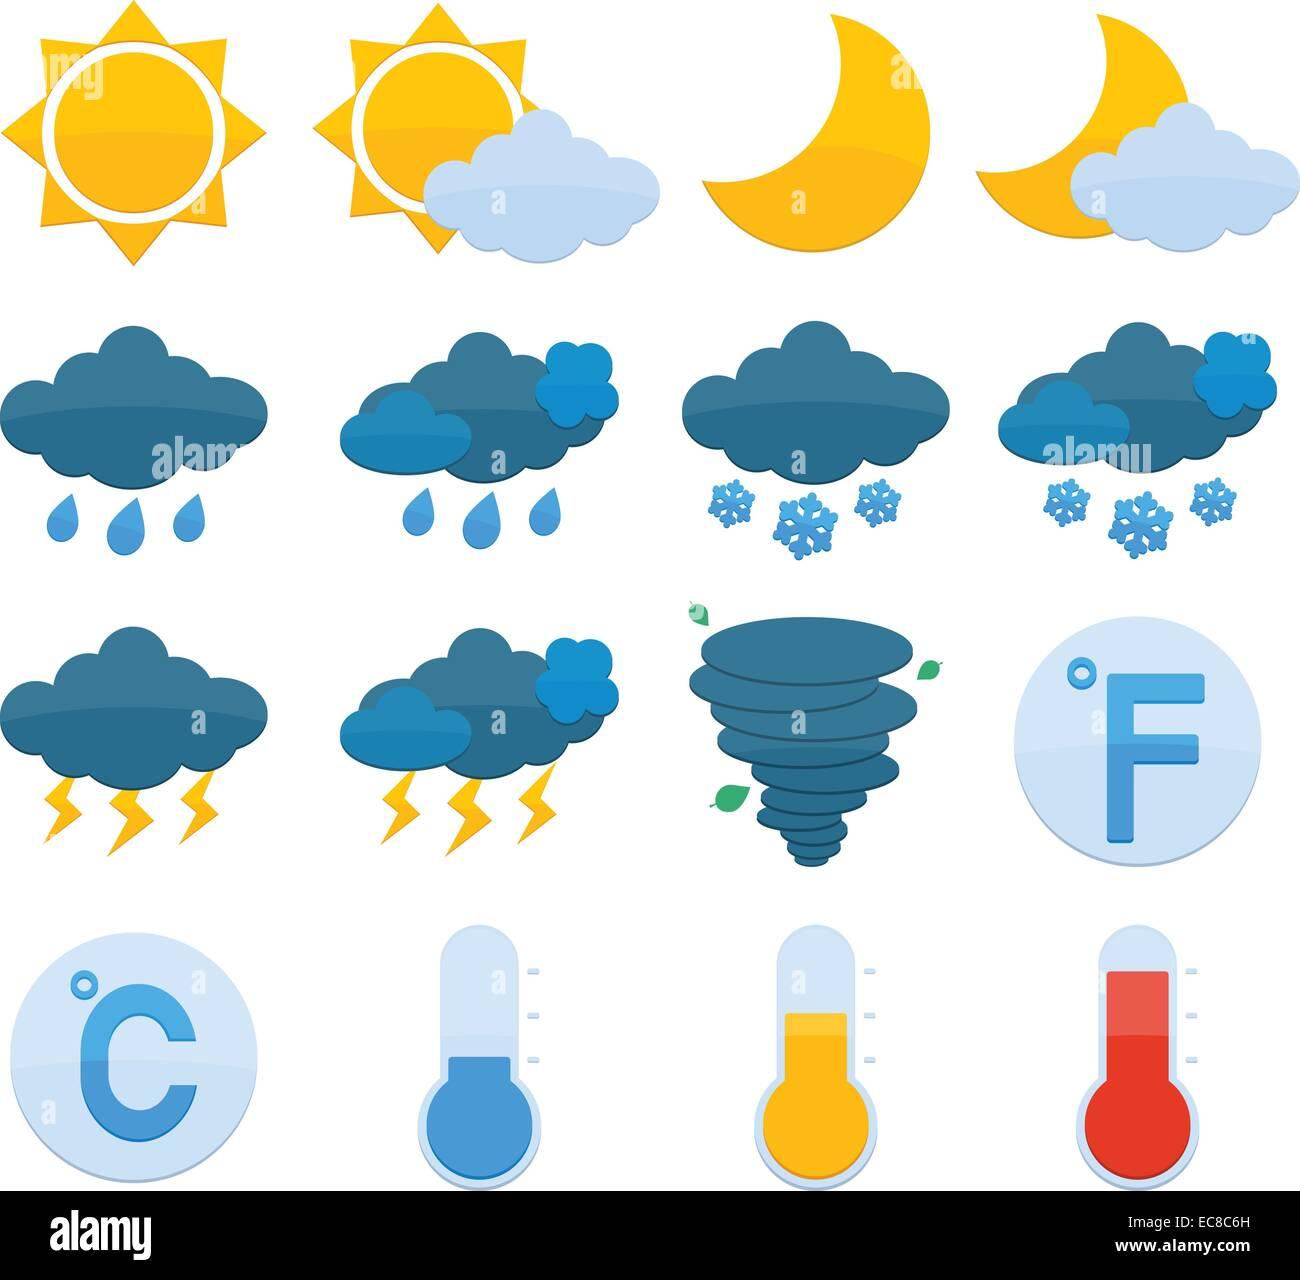 Weather forecast symbols color icons set of sun cloud rain snow weather forecast symbols color icons set of sun cloud rain snow isolated vector illustration biocorpaavc